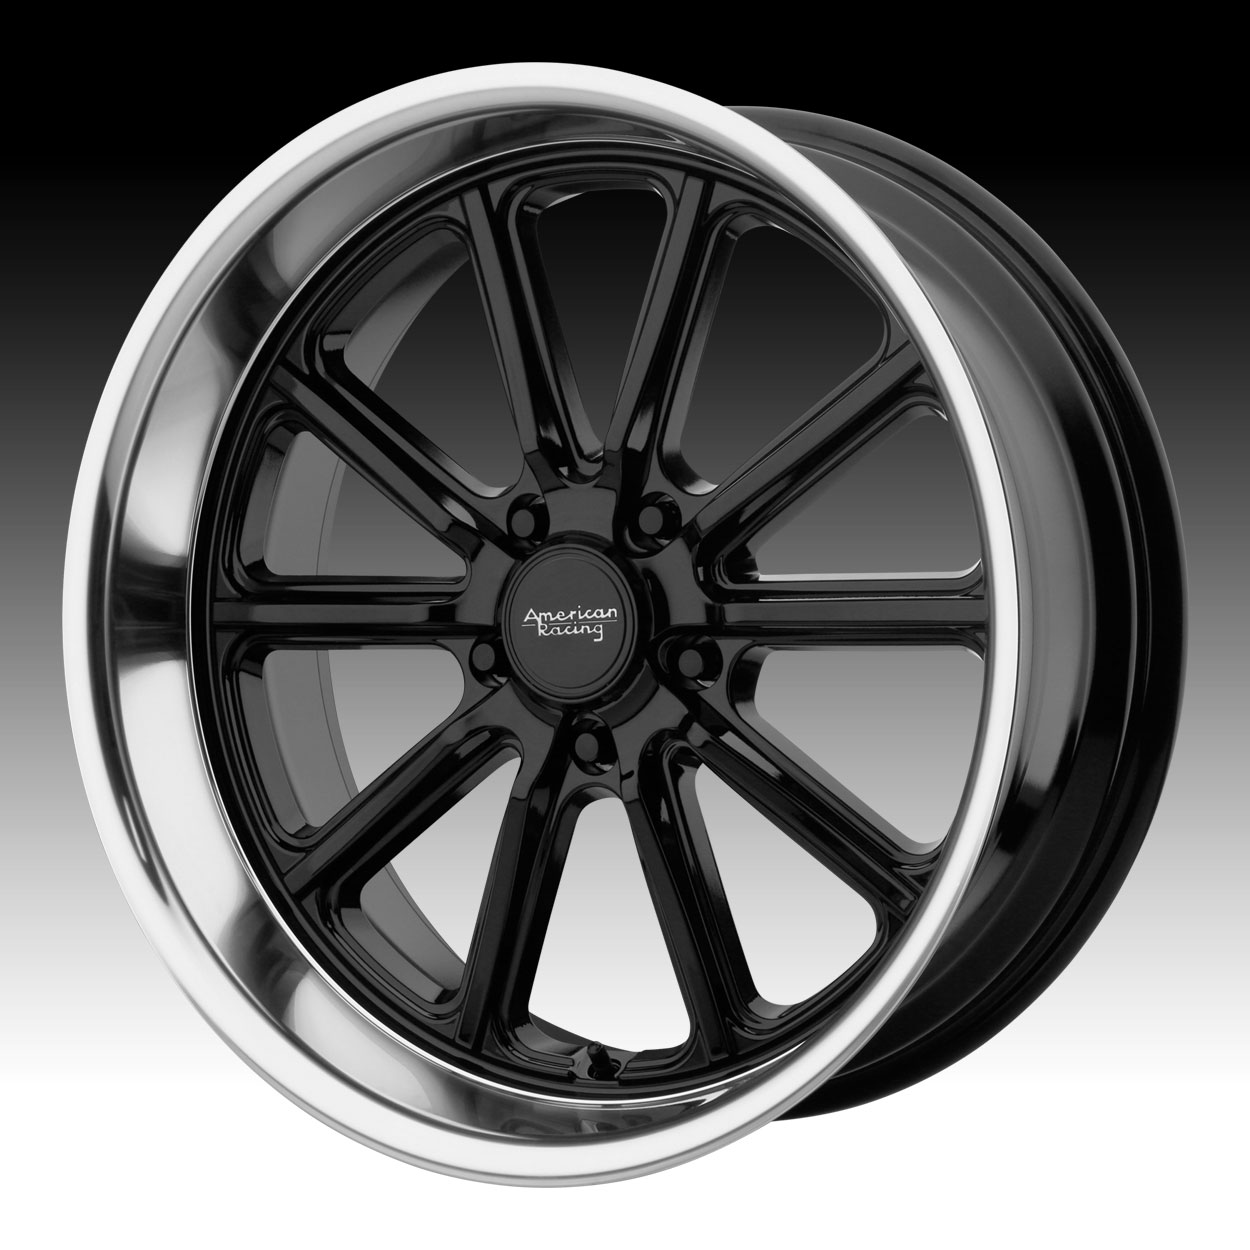 American Racing 18x8 VN507 Rodder Wheel Vintage Silver Diamond Cut 5x115 15mm